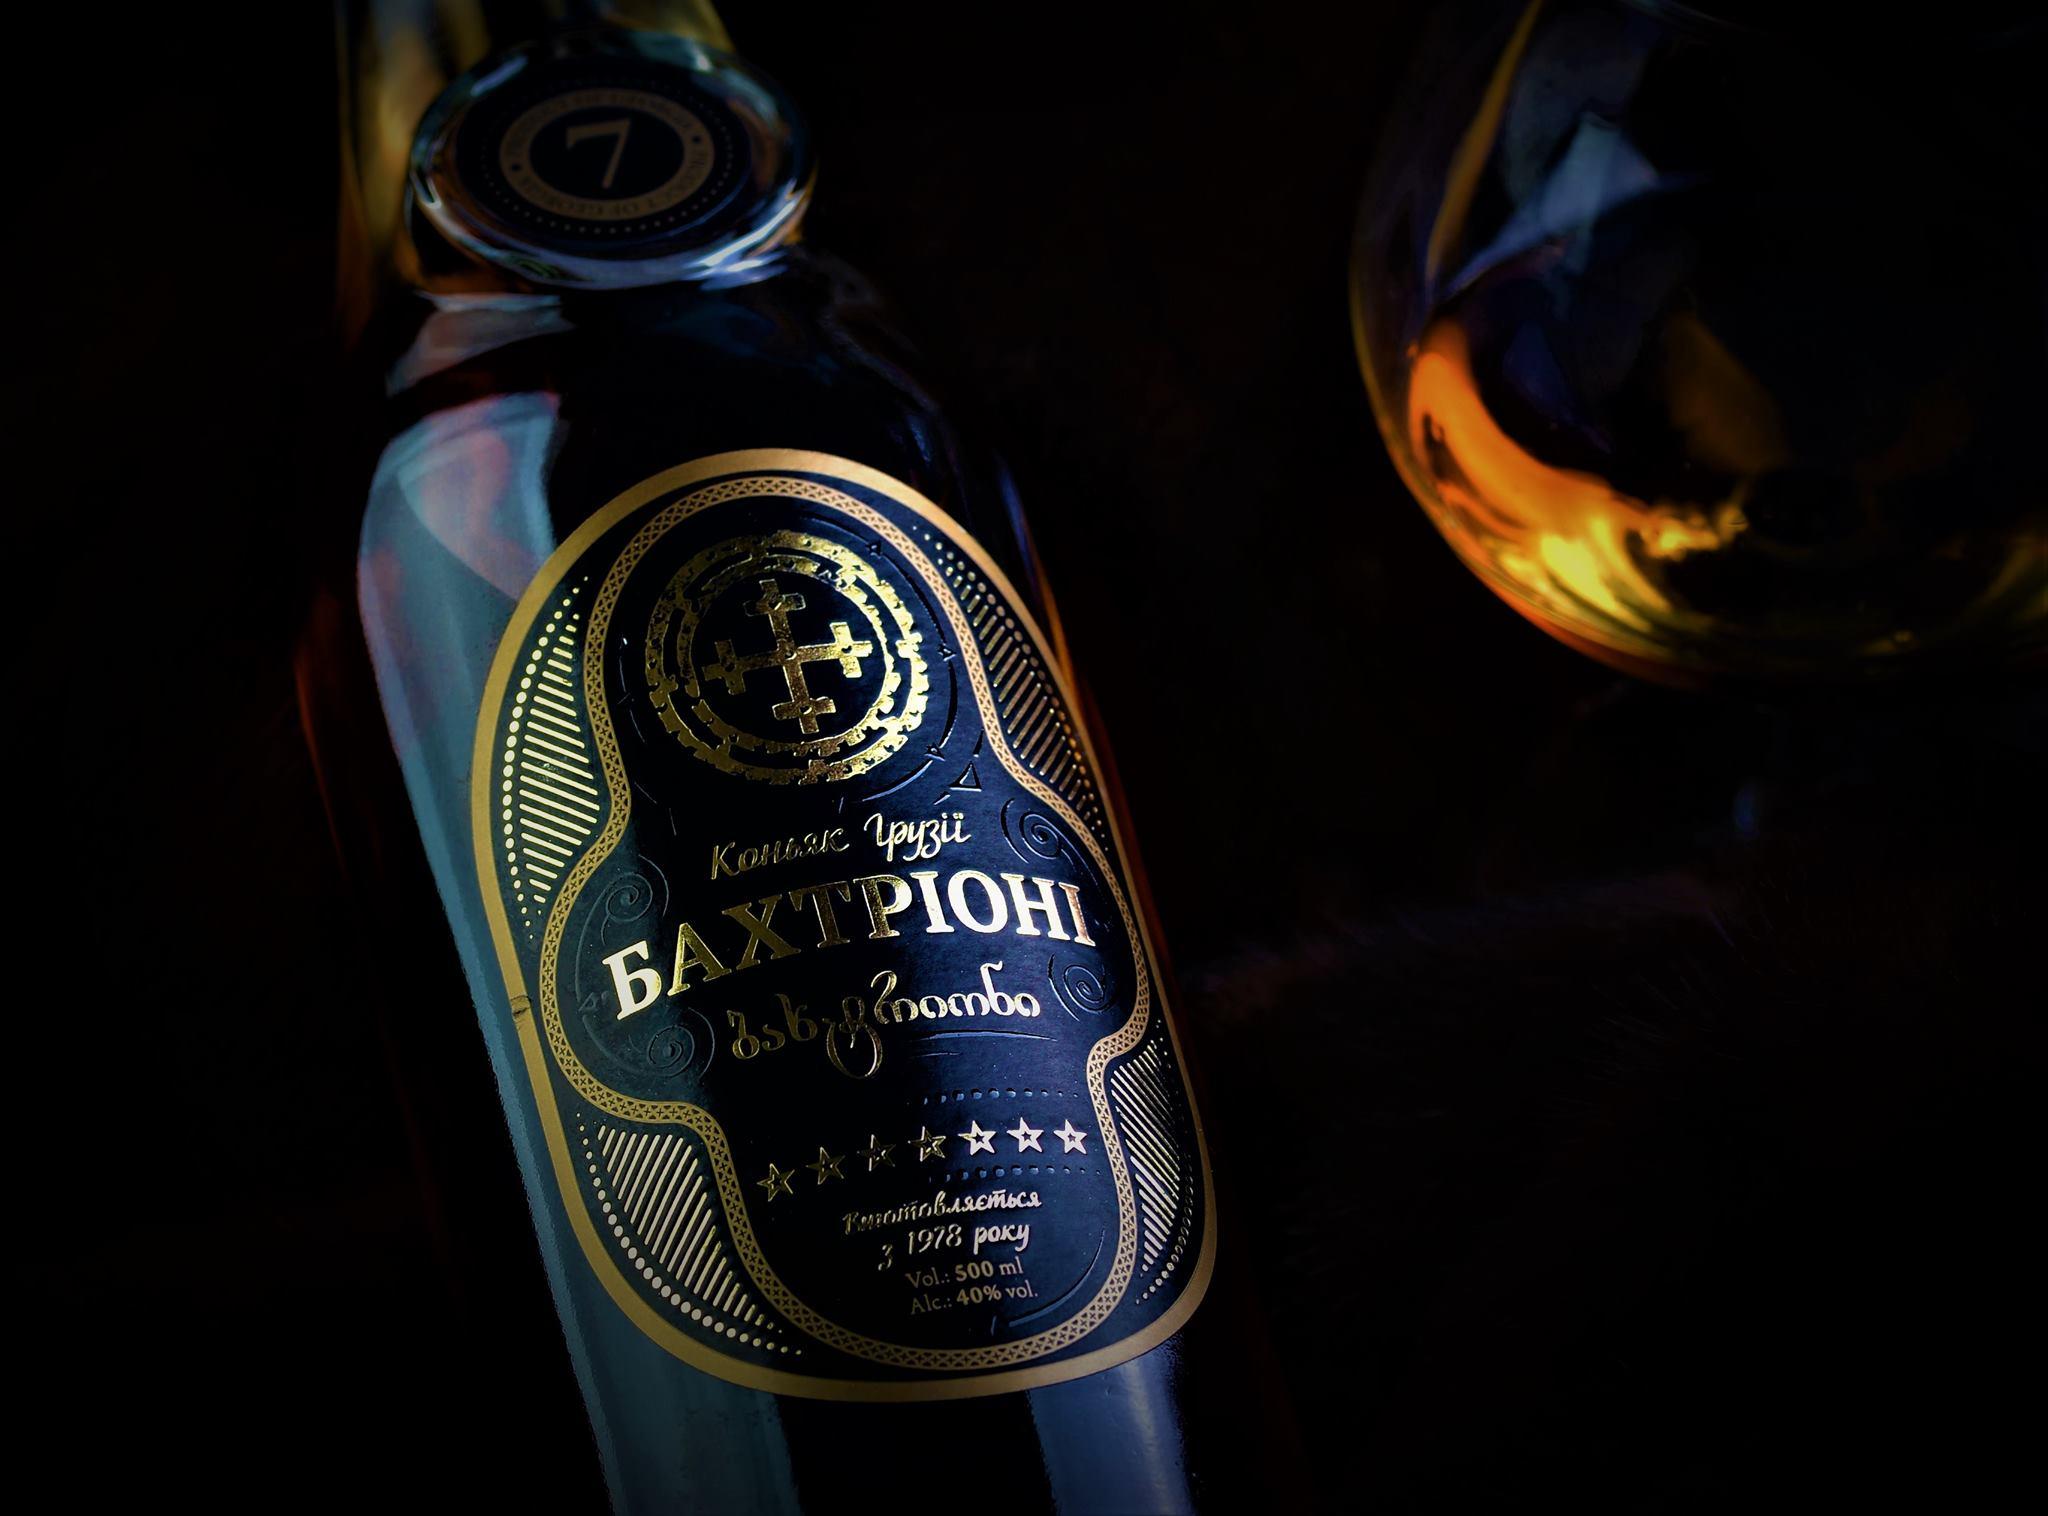 коньяк Бахтриони